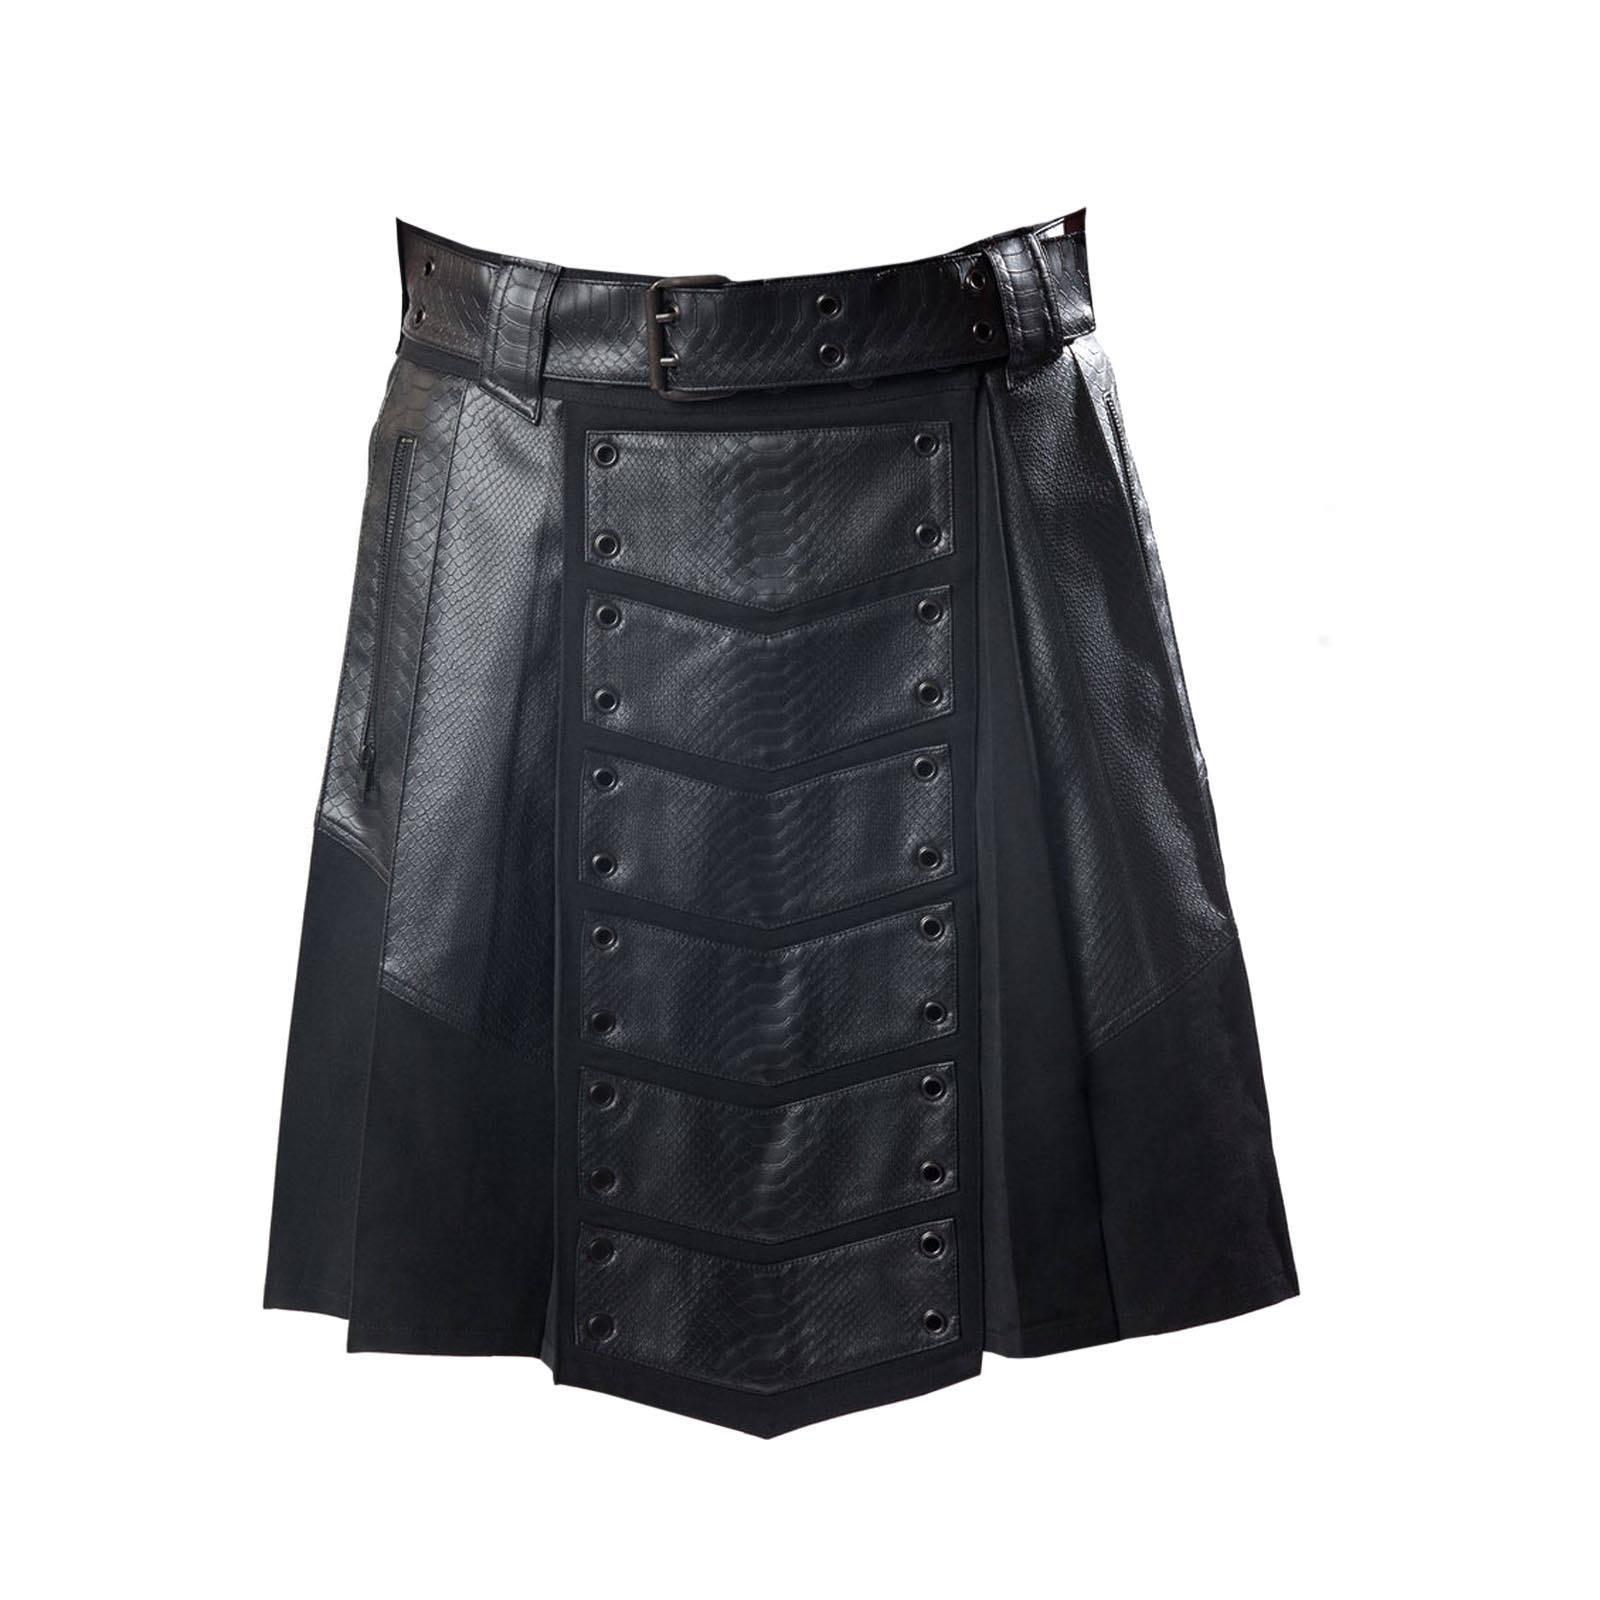 Leather Patch Gothic Utility Kilt